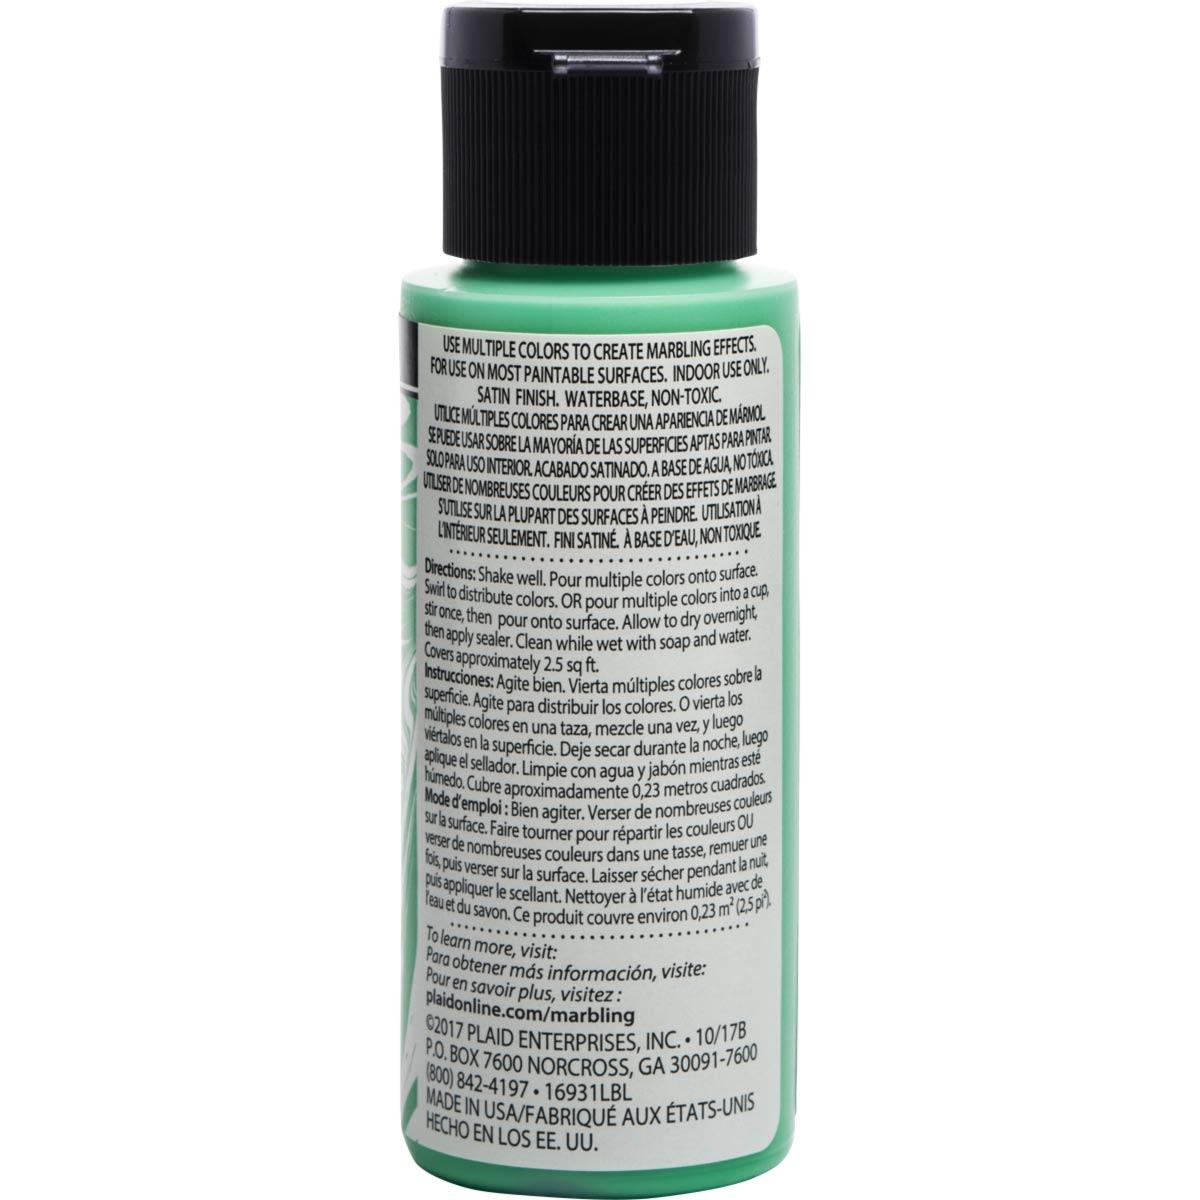 FolkArt ® Marbling Paint - Green, 2 oz.